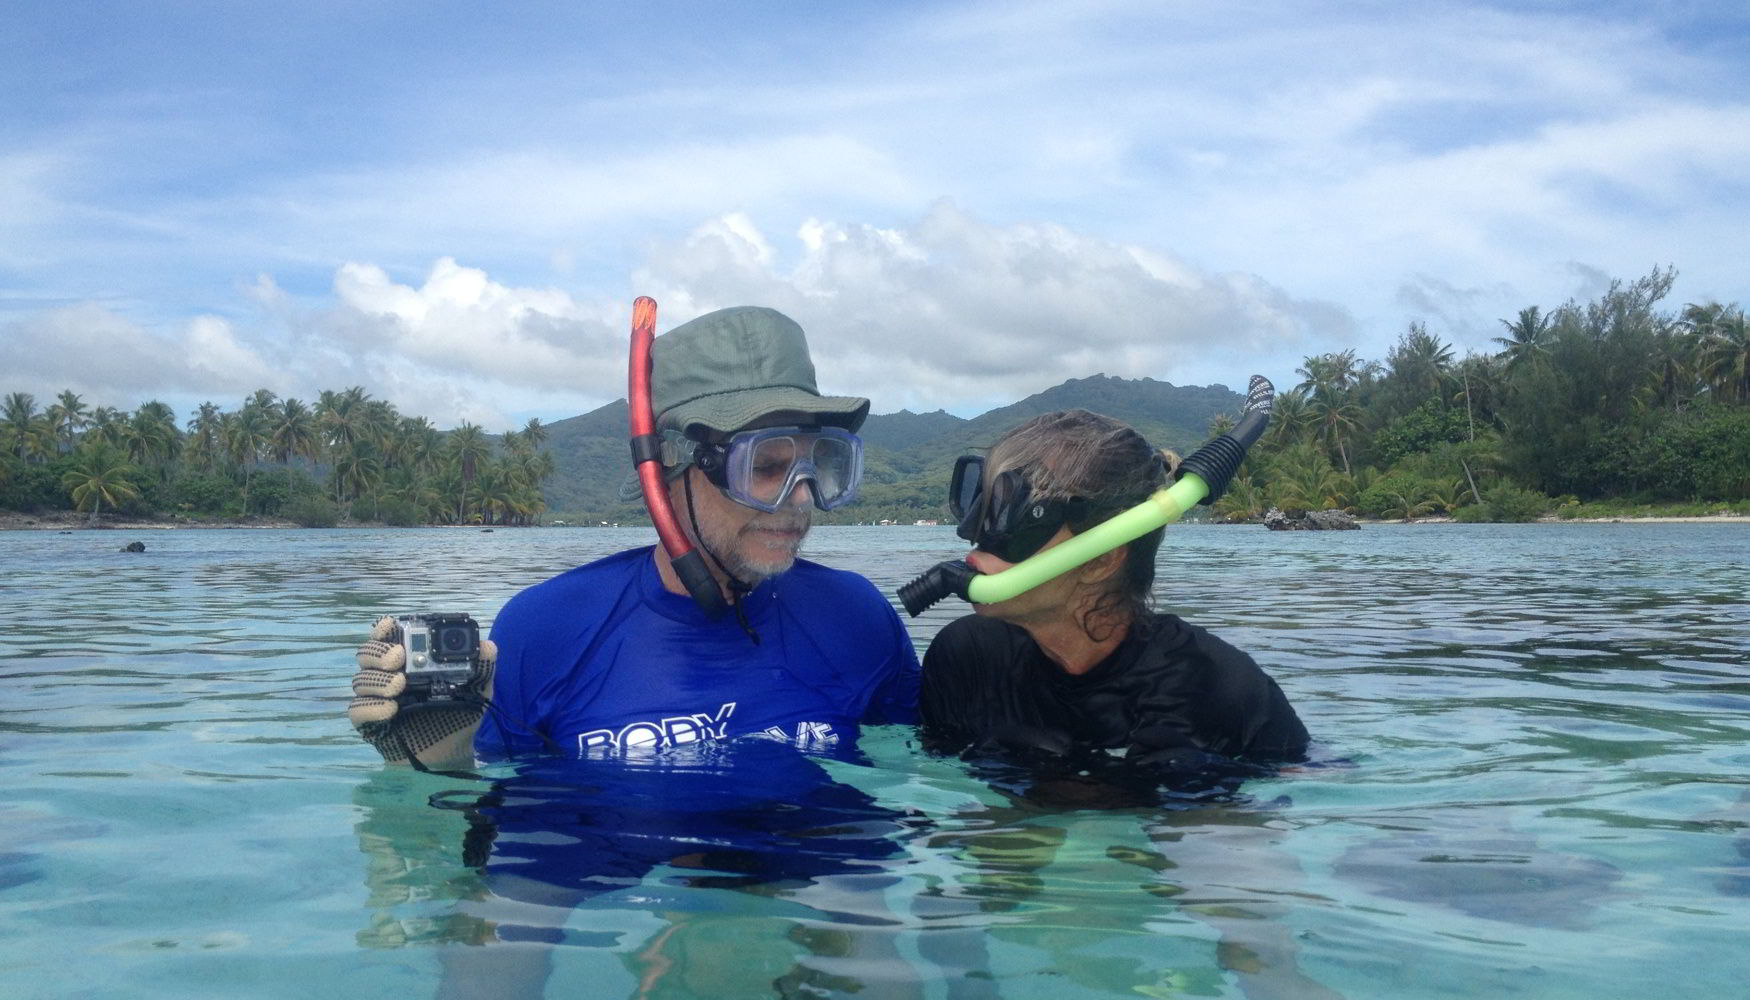 Snorkeling in Tahiti with GoPro camera